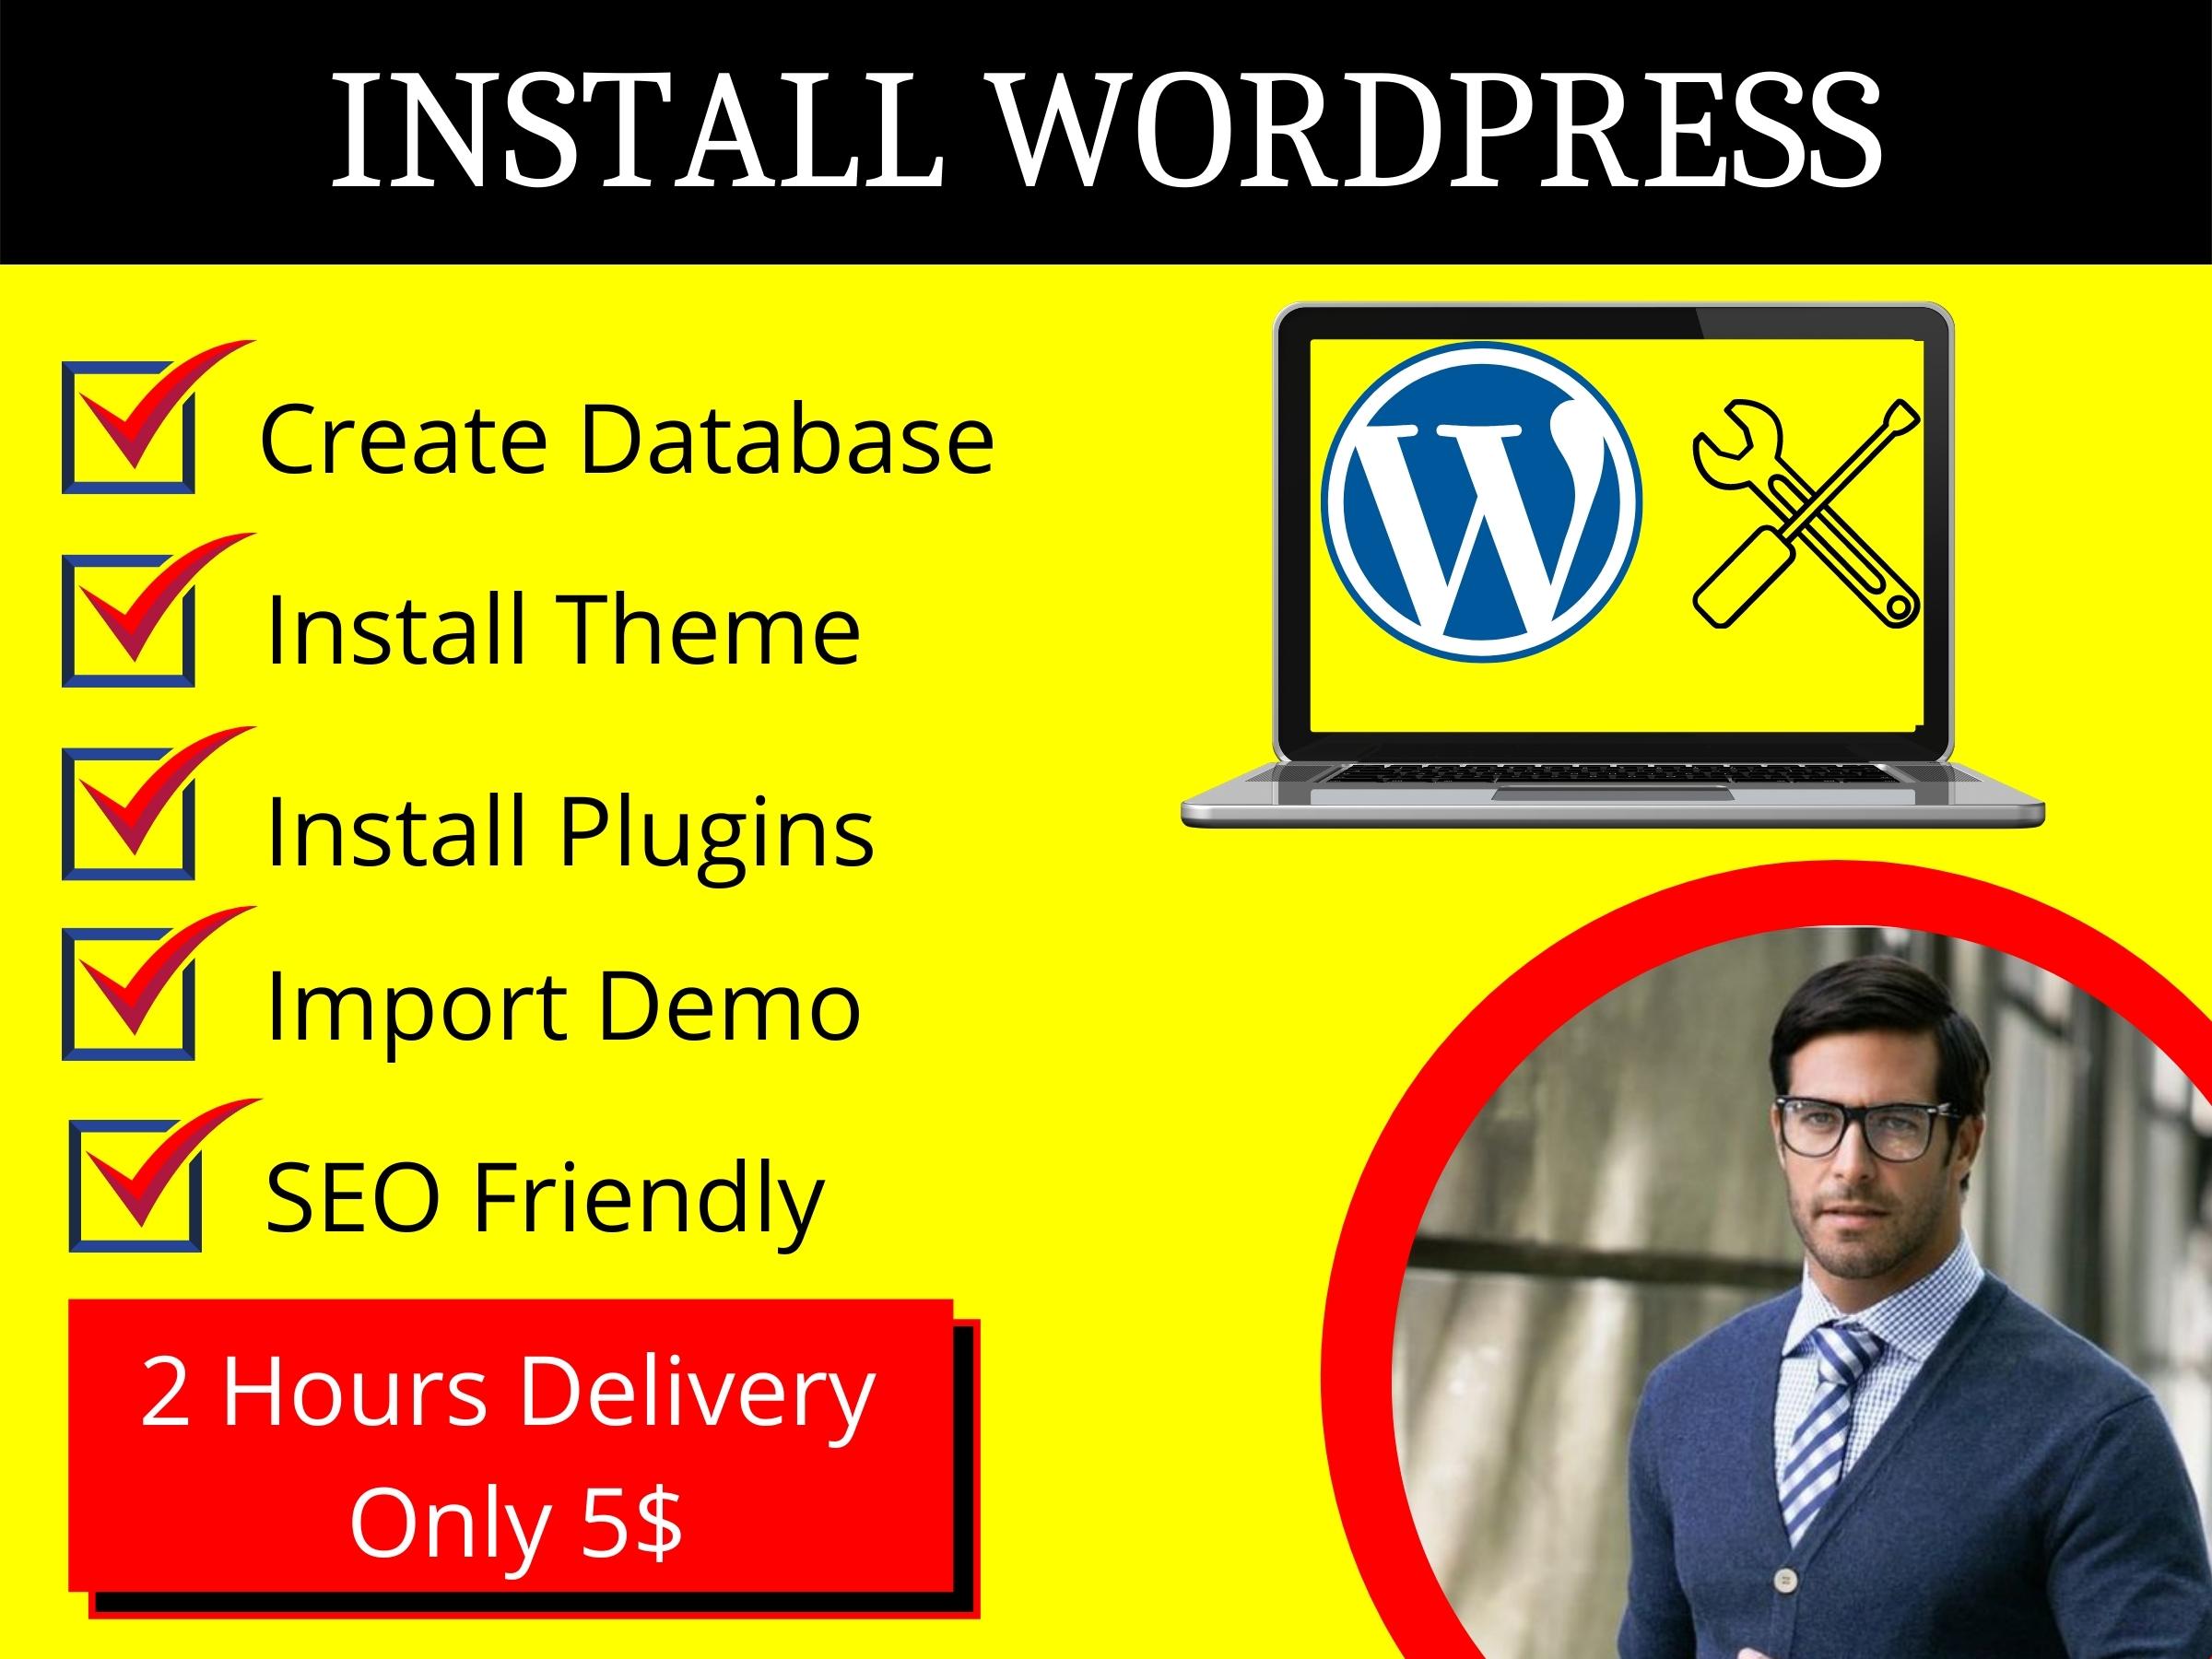 I will install WordPress,  setup theme,  plugin,  demo import,  and customization.